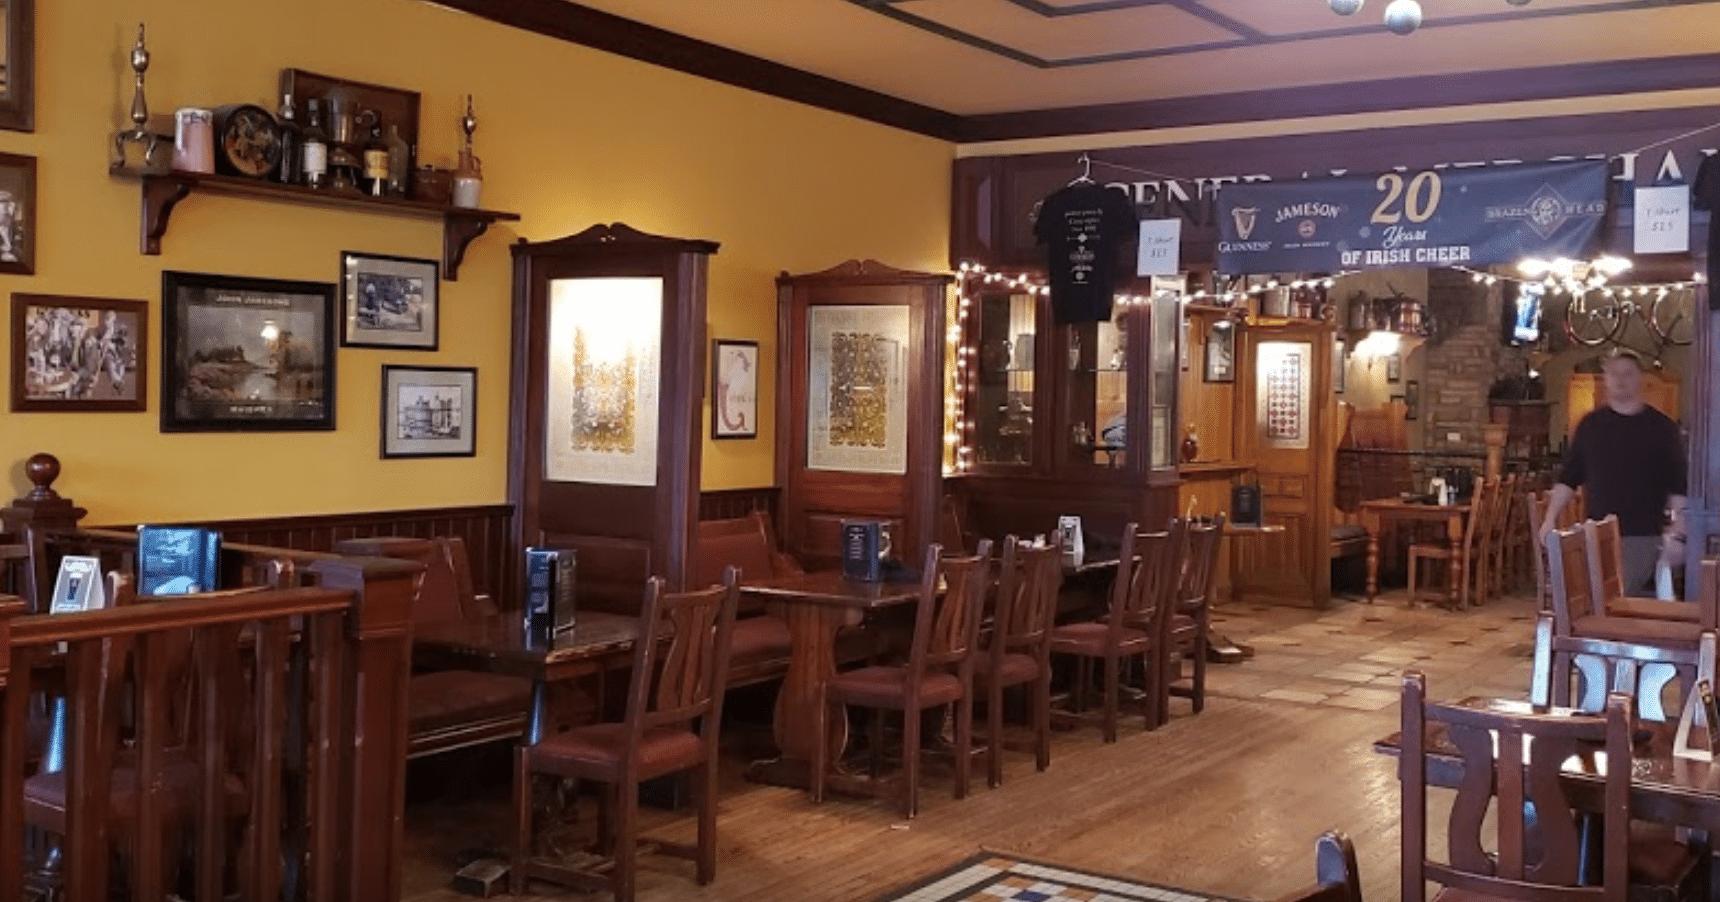 The 50 Best Irish Bars In America – Big 7 Travel Guide